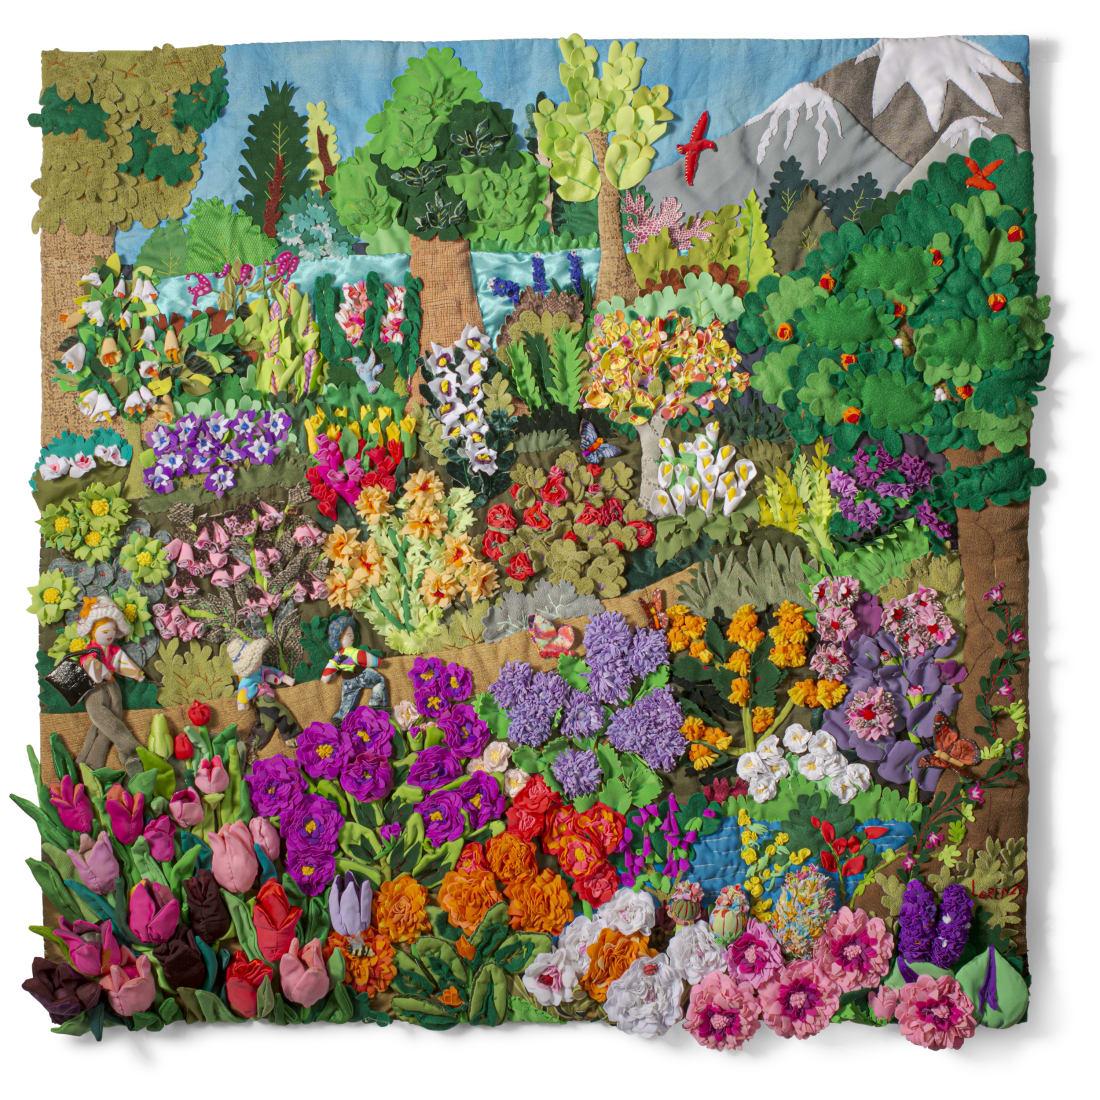 Botanical Garden - Large Square